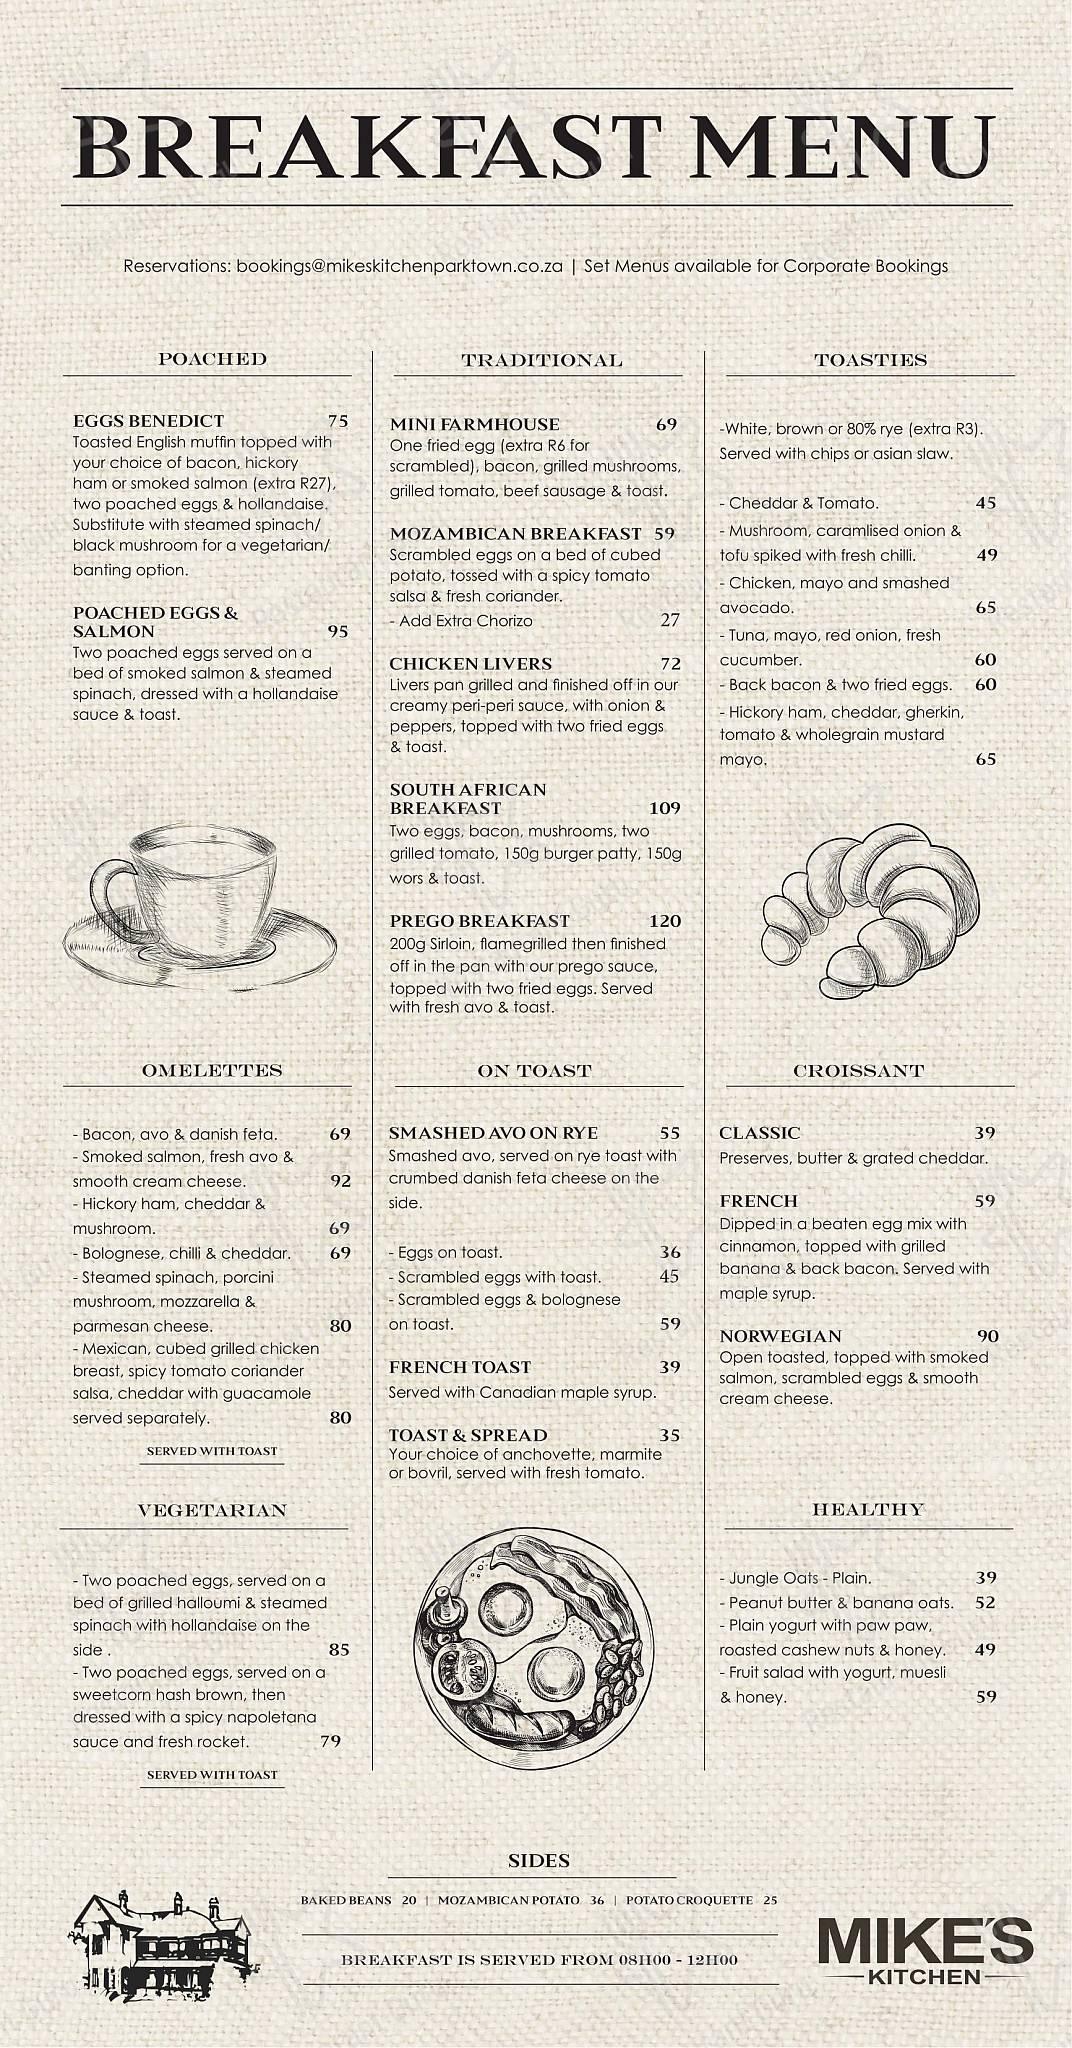 Mike's Kitchen - Breakfast Menu